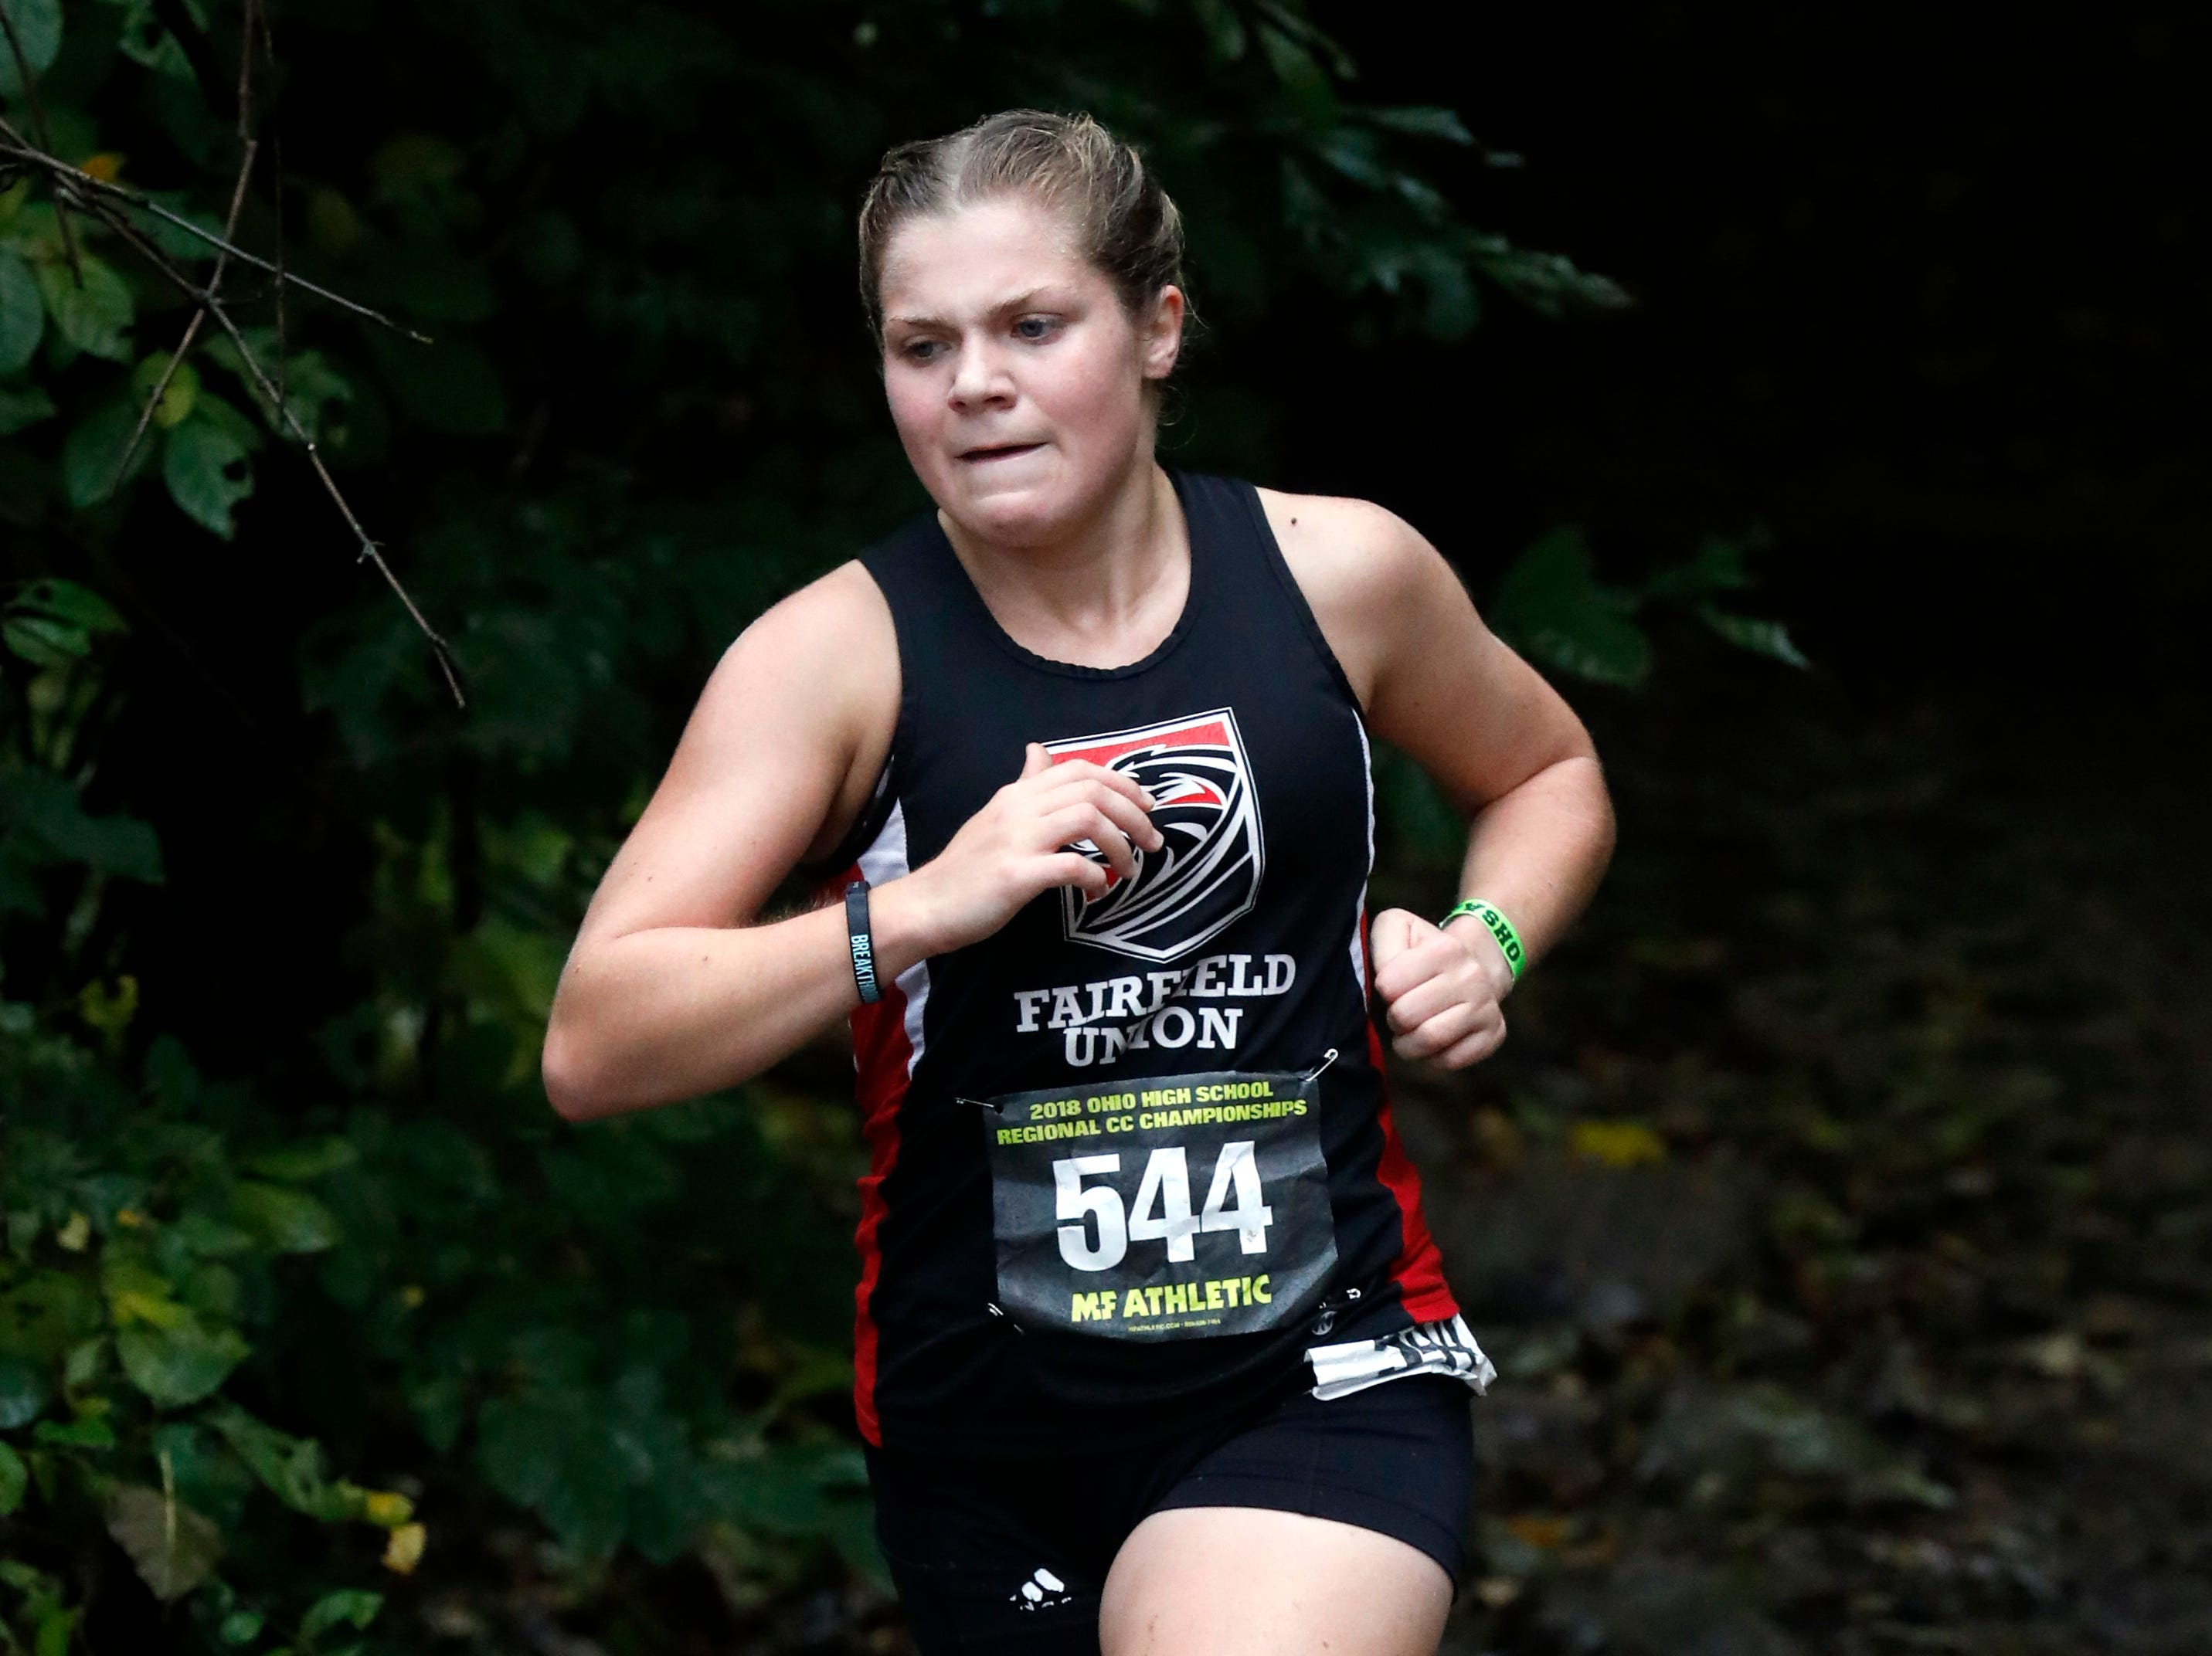 Fairfield Union's Dorothy King runs in the Regional Cross Country meet Saturday, Oct. 27, 2018, at Pickerington North High School in Pickerington.